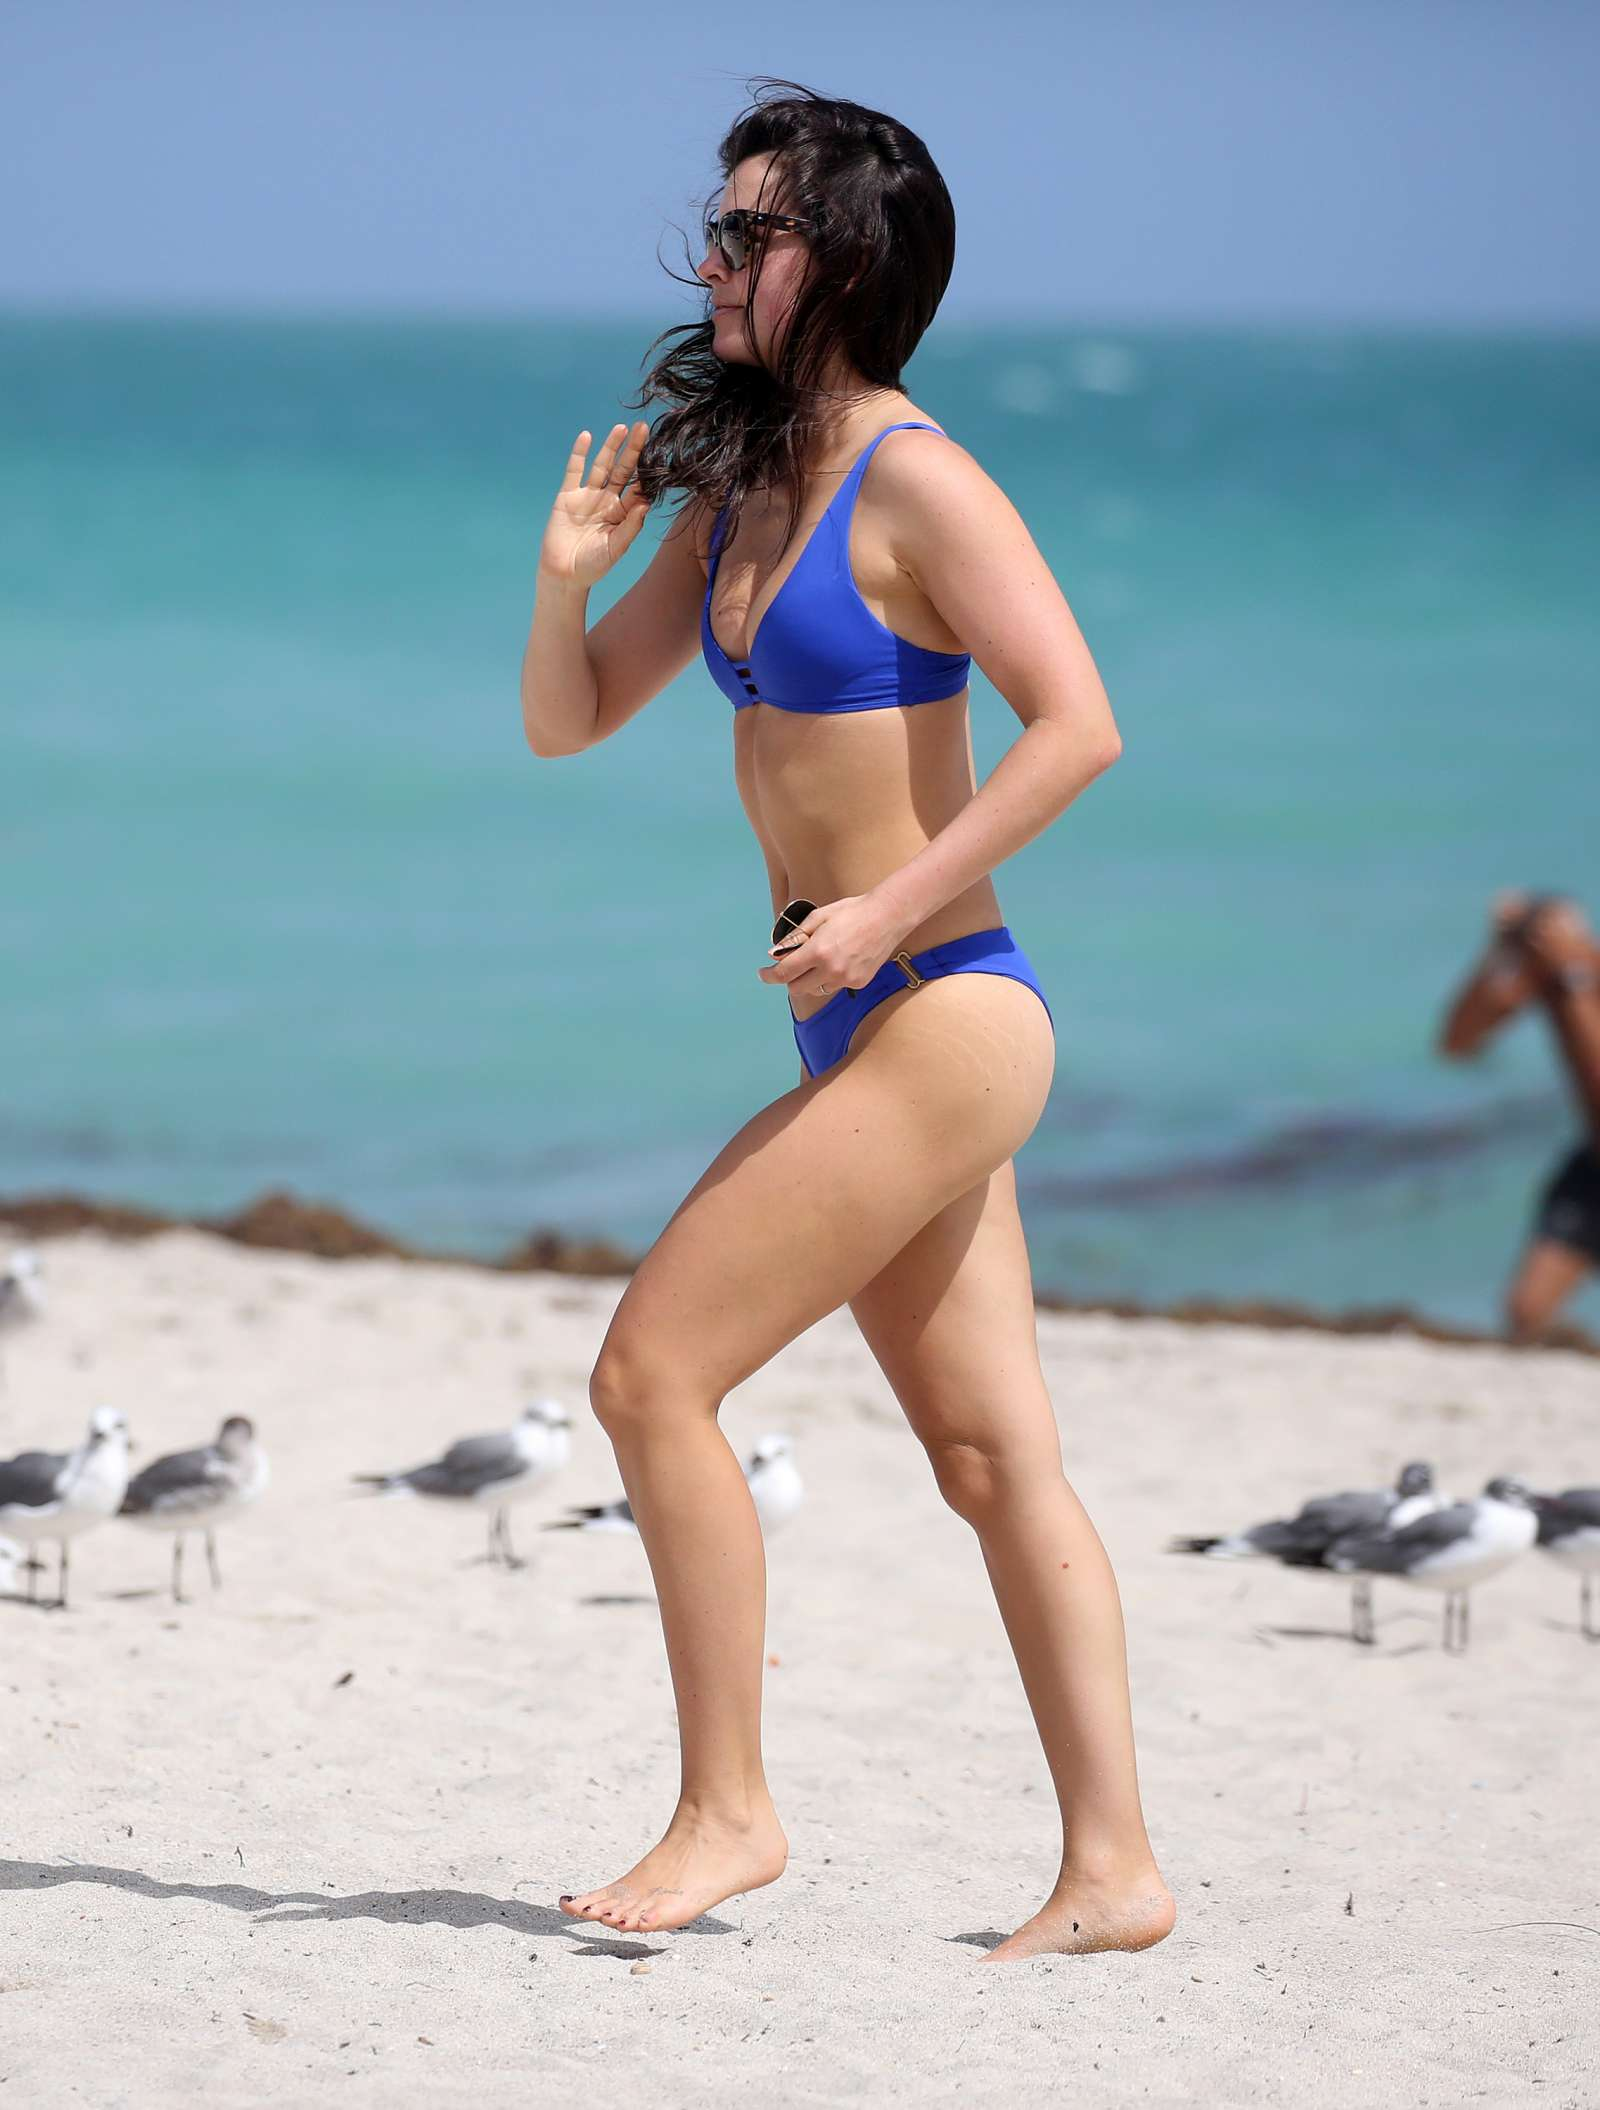 Bethenny Frankel 2019 : Bethenny Frankel in Blue Bikini 2019 -07